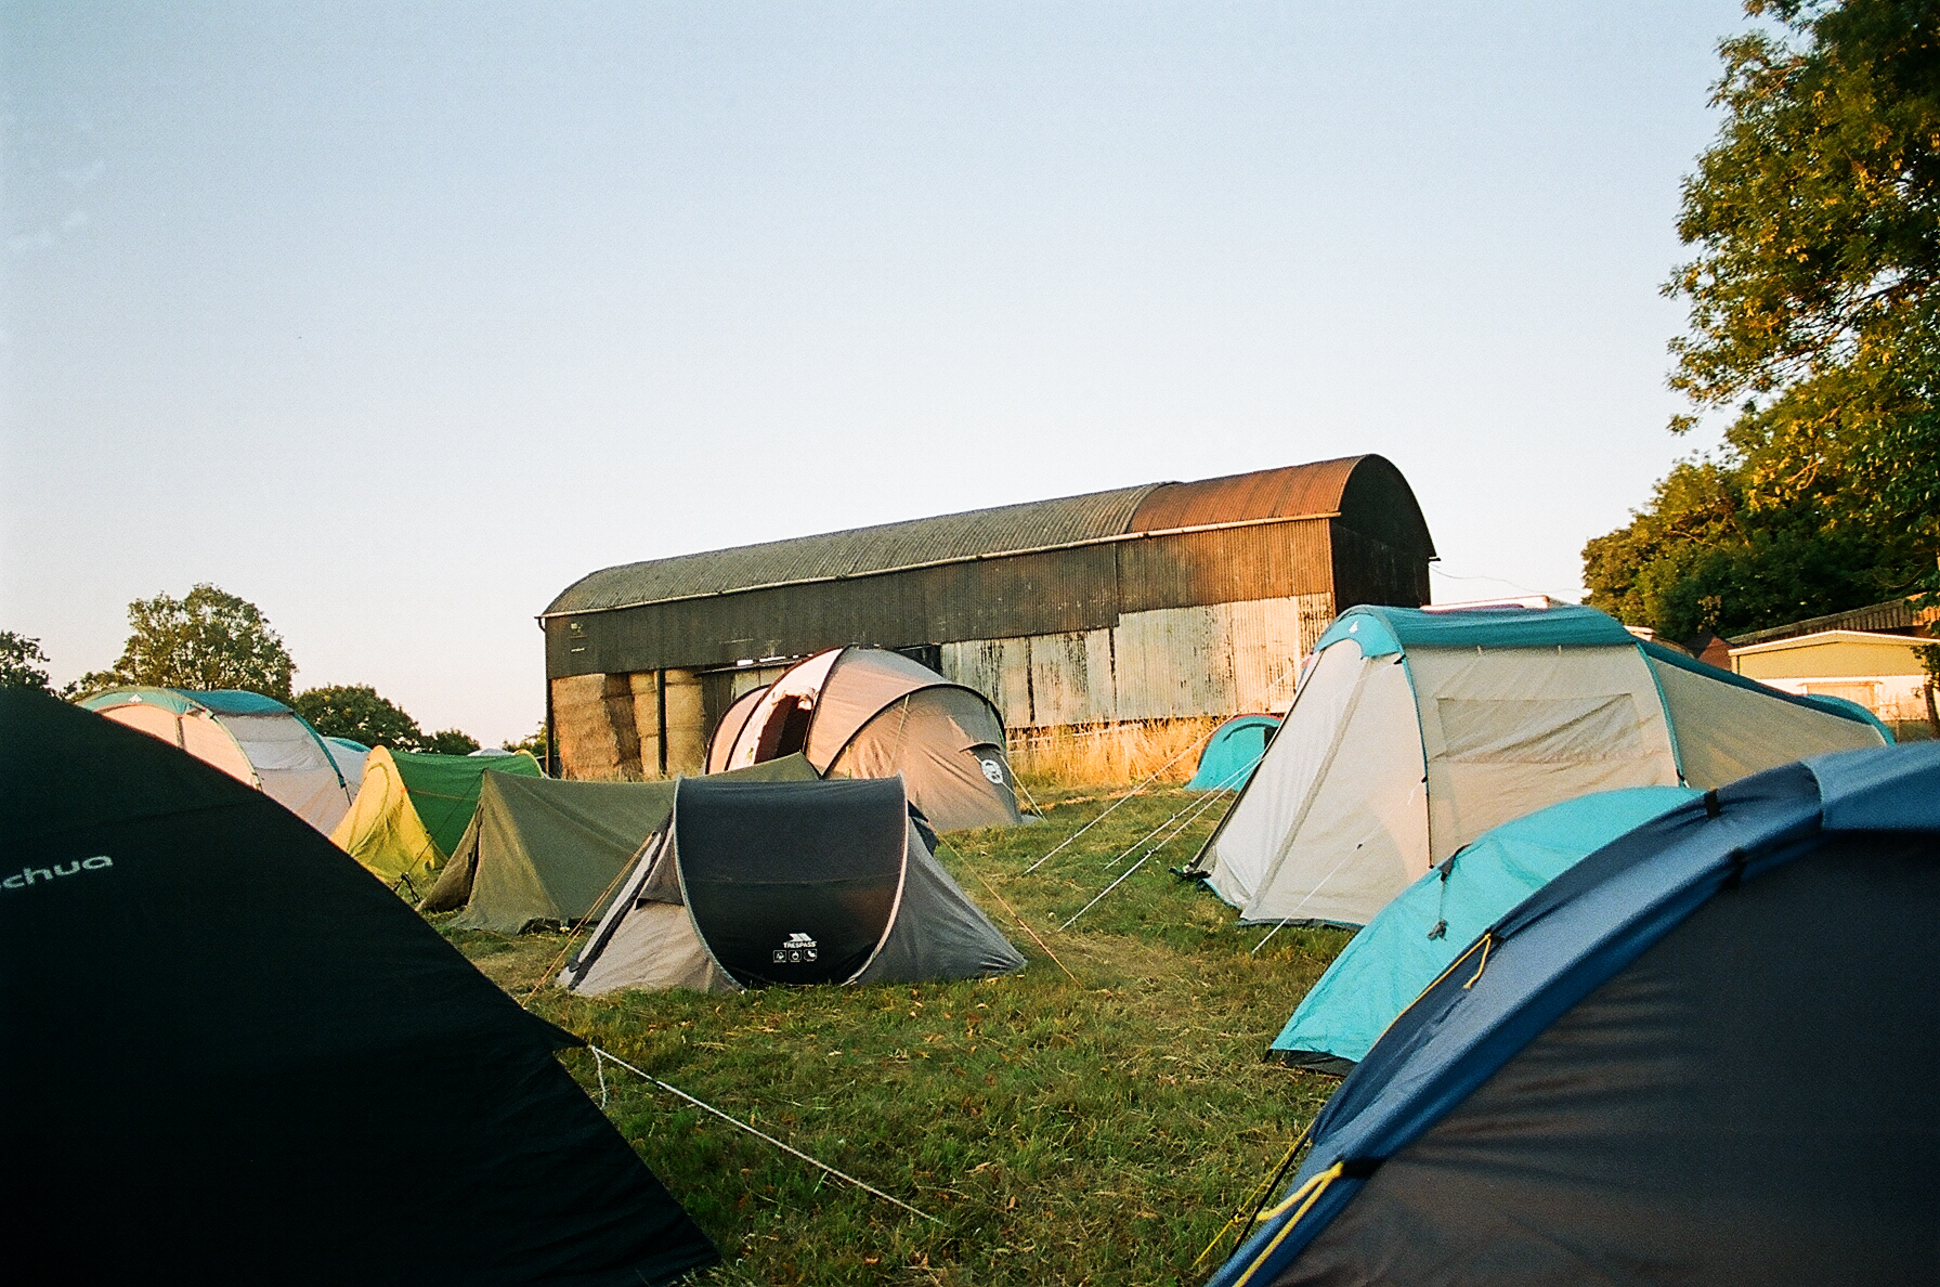 110 Above Festival - August 2018 - 35mm - Ant Adams-22.jpg